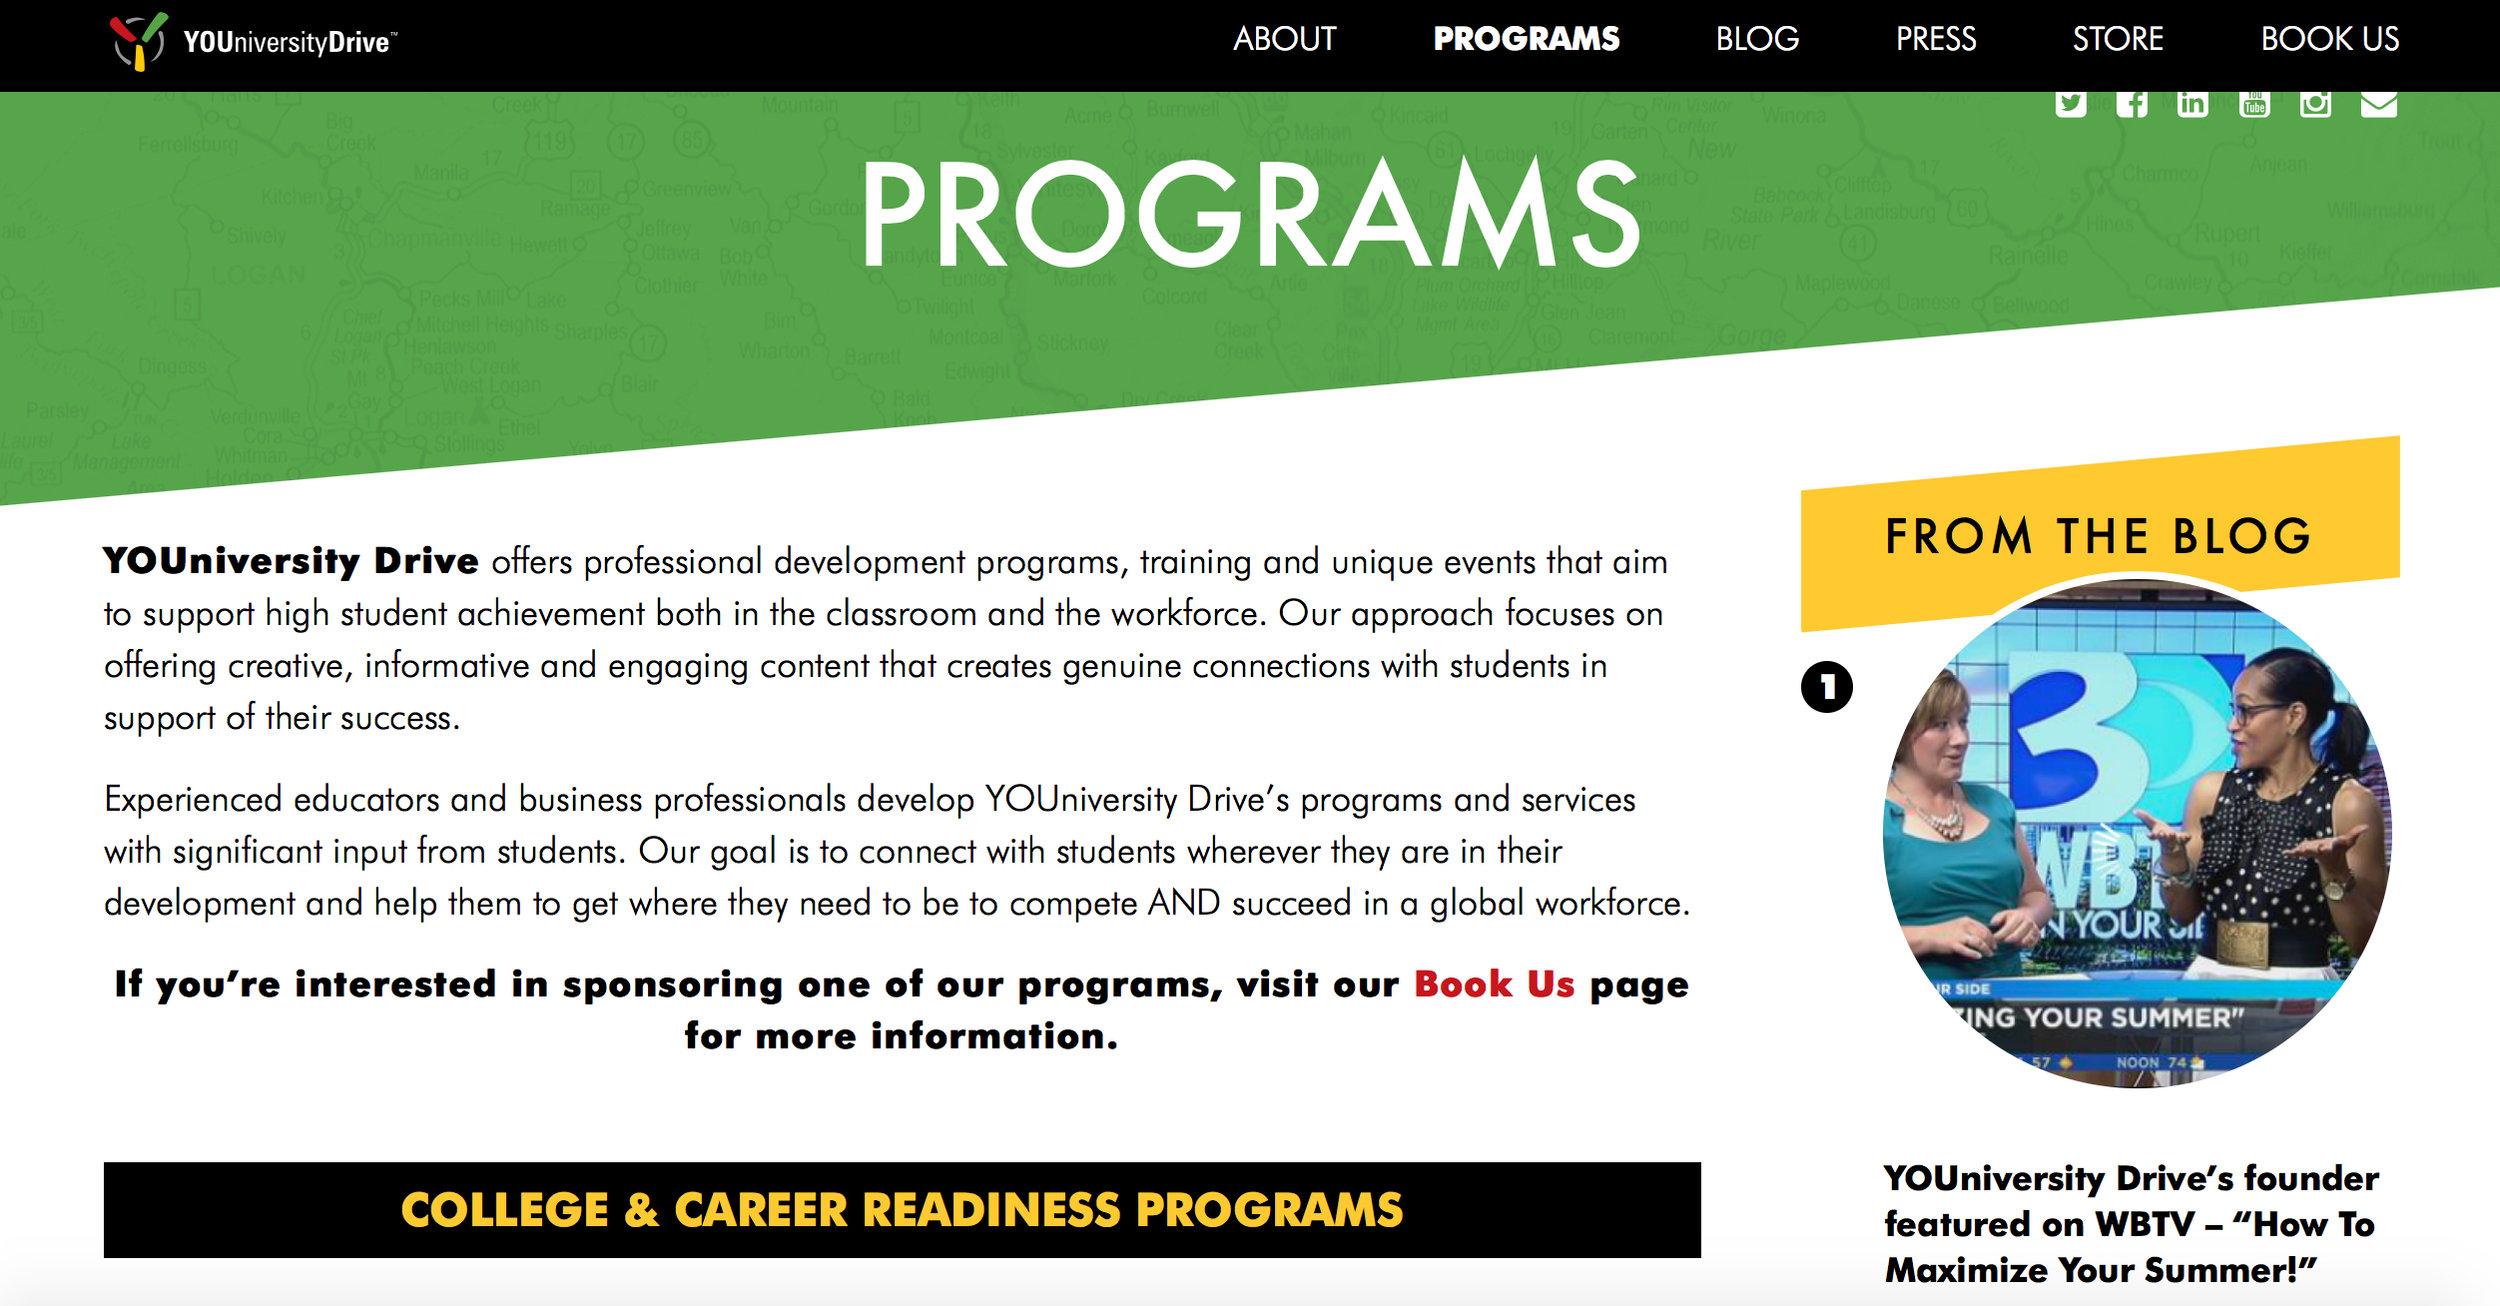 YD Programs1_screenshot.jpg